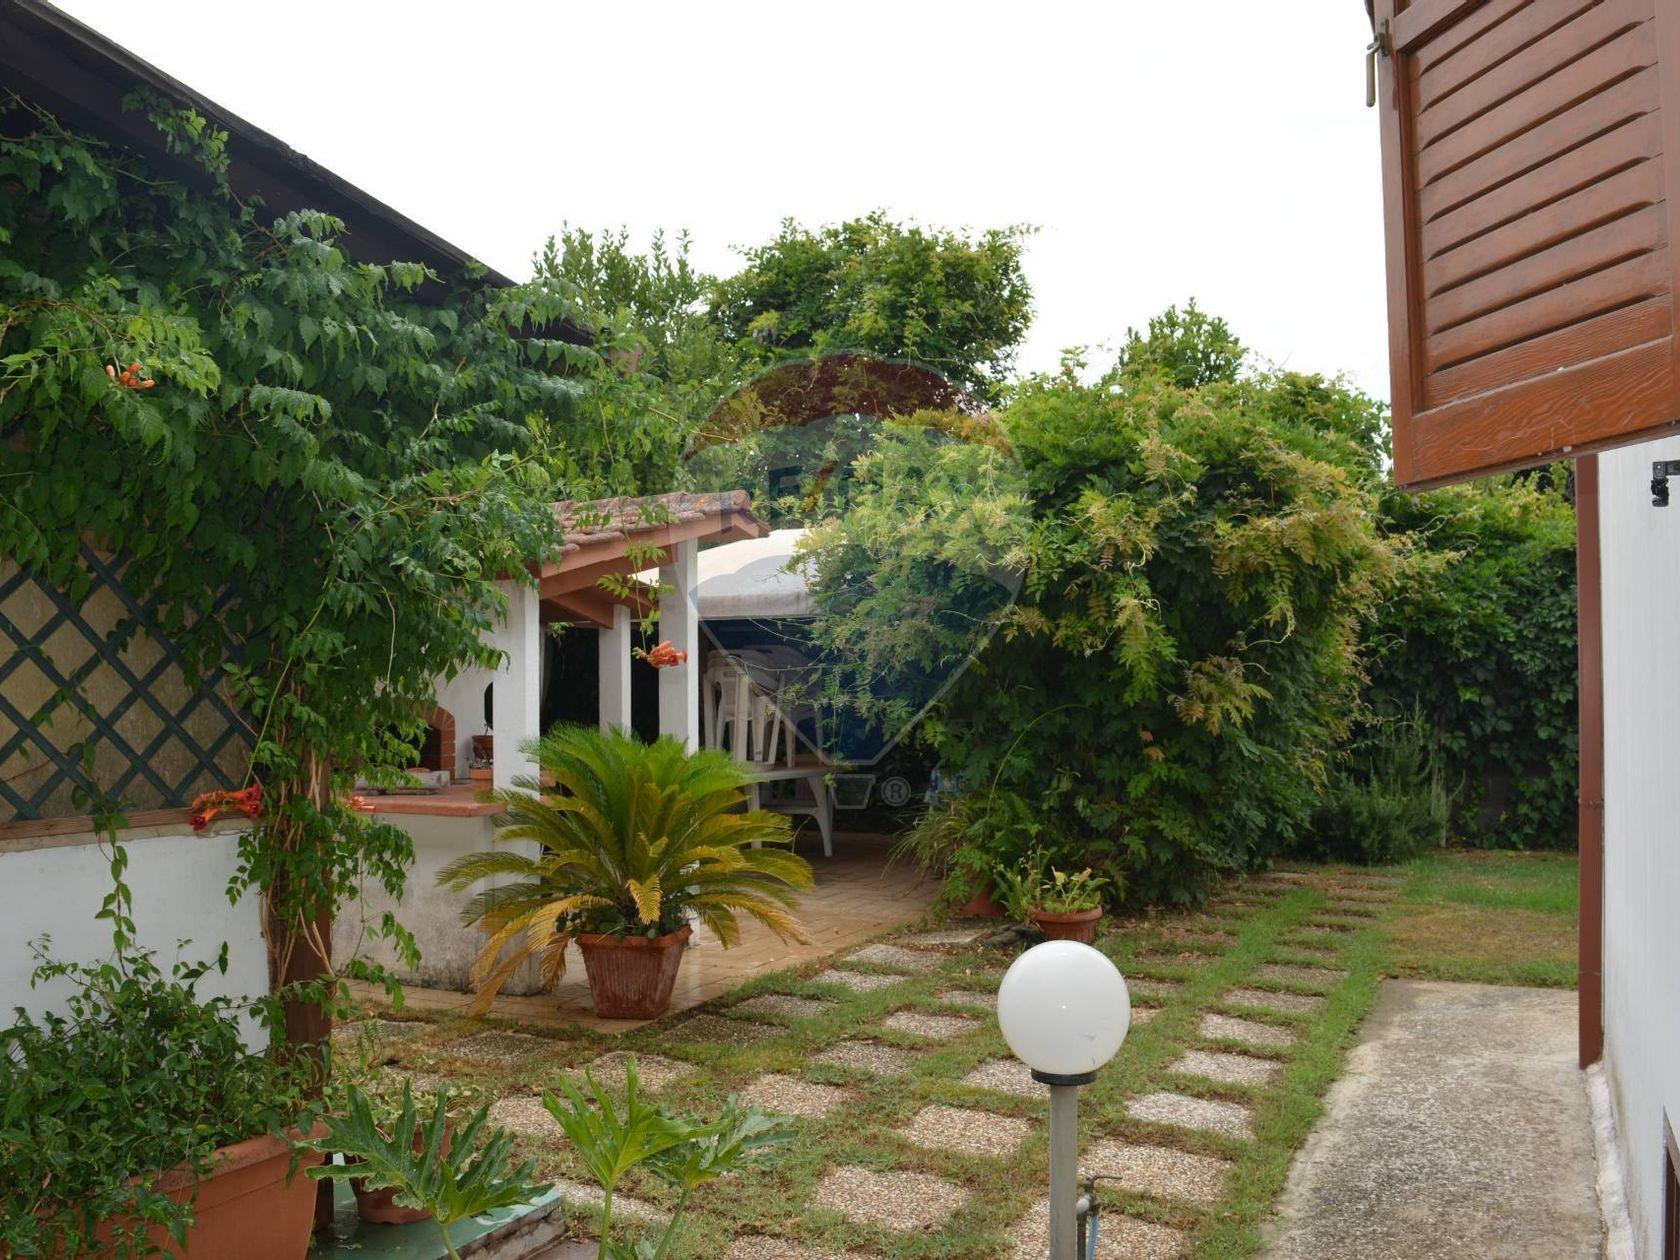 Villa singola Ardea - Nuova Florida, Ardea, RM Vendita - Foto 9